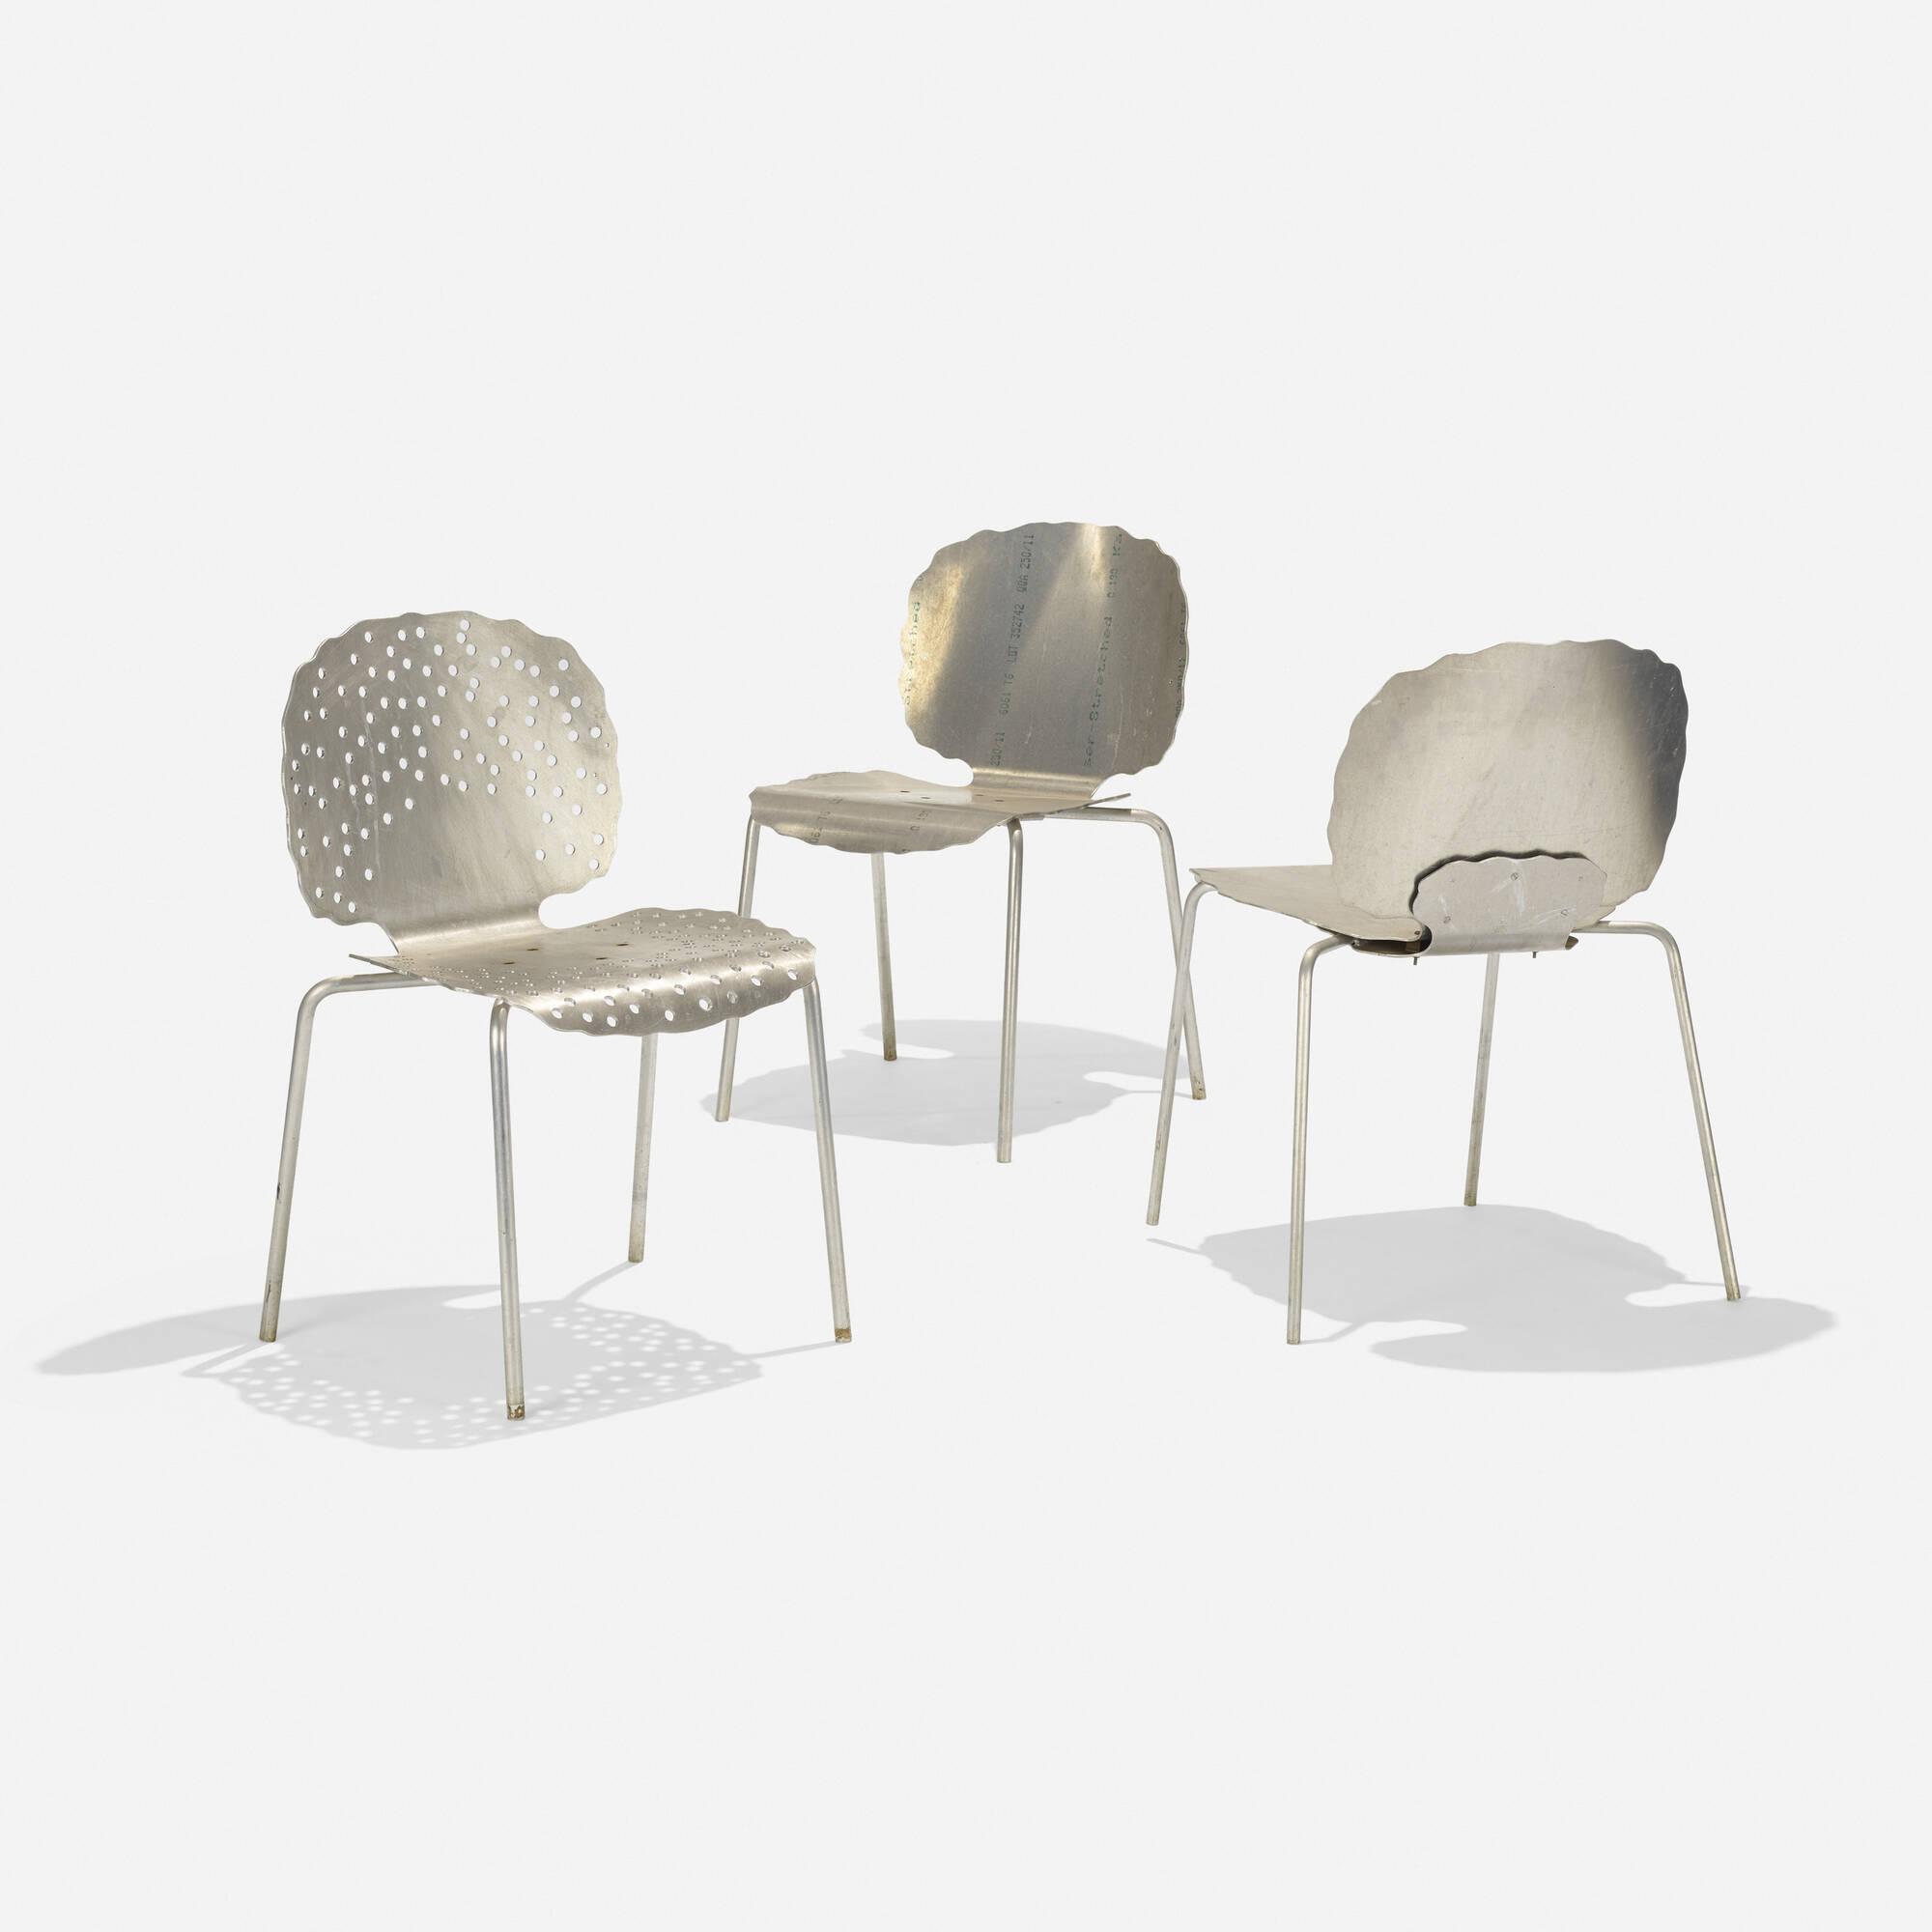 143 Richard Schultz Prototype Topiary Stacking chairs three